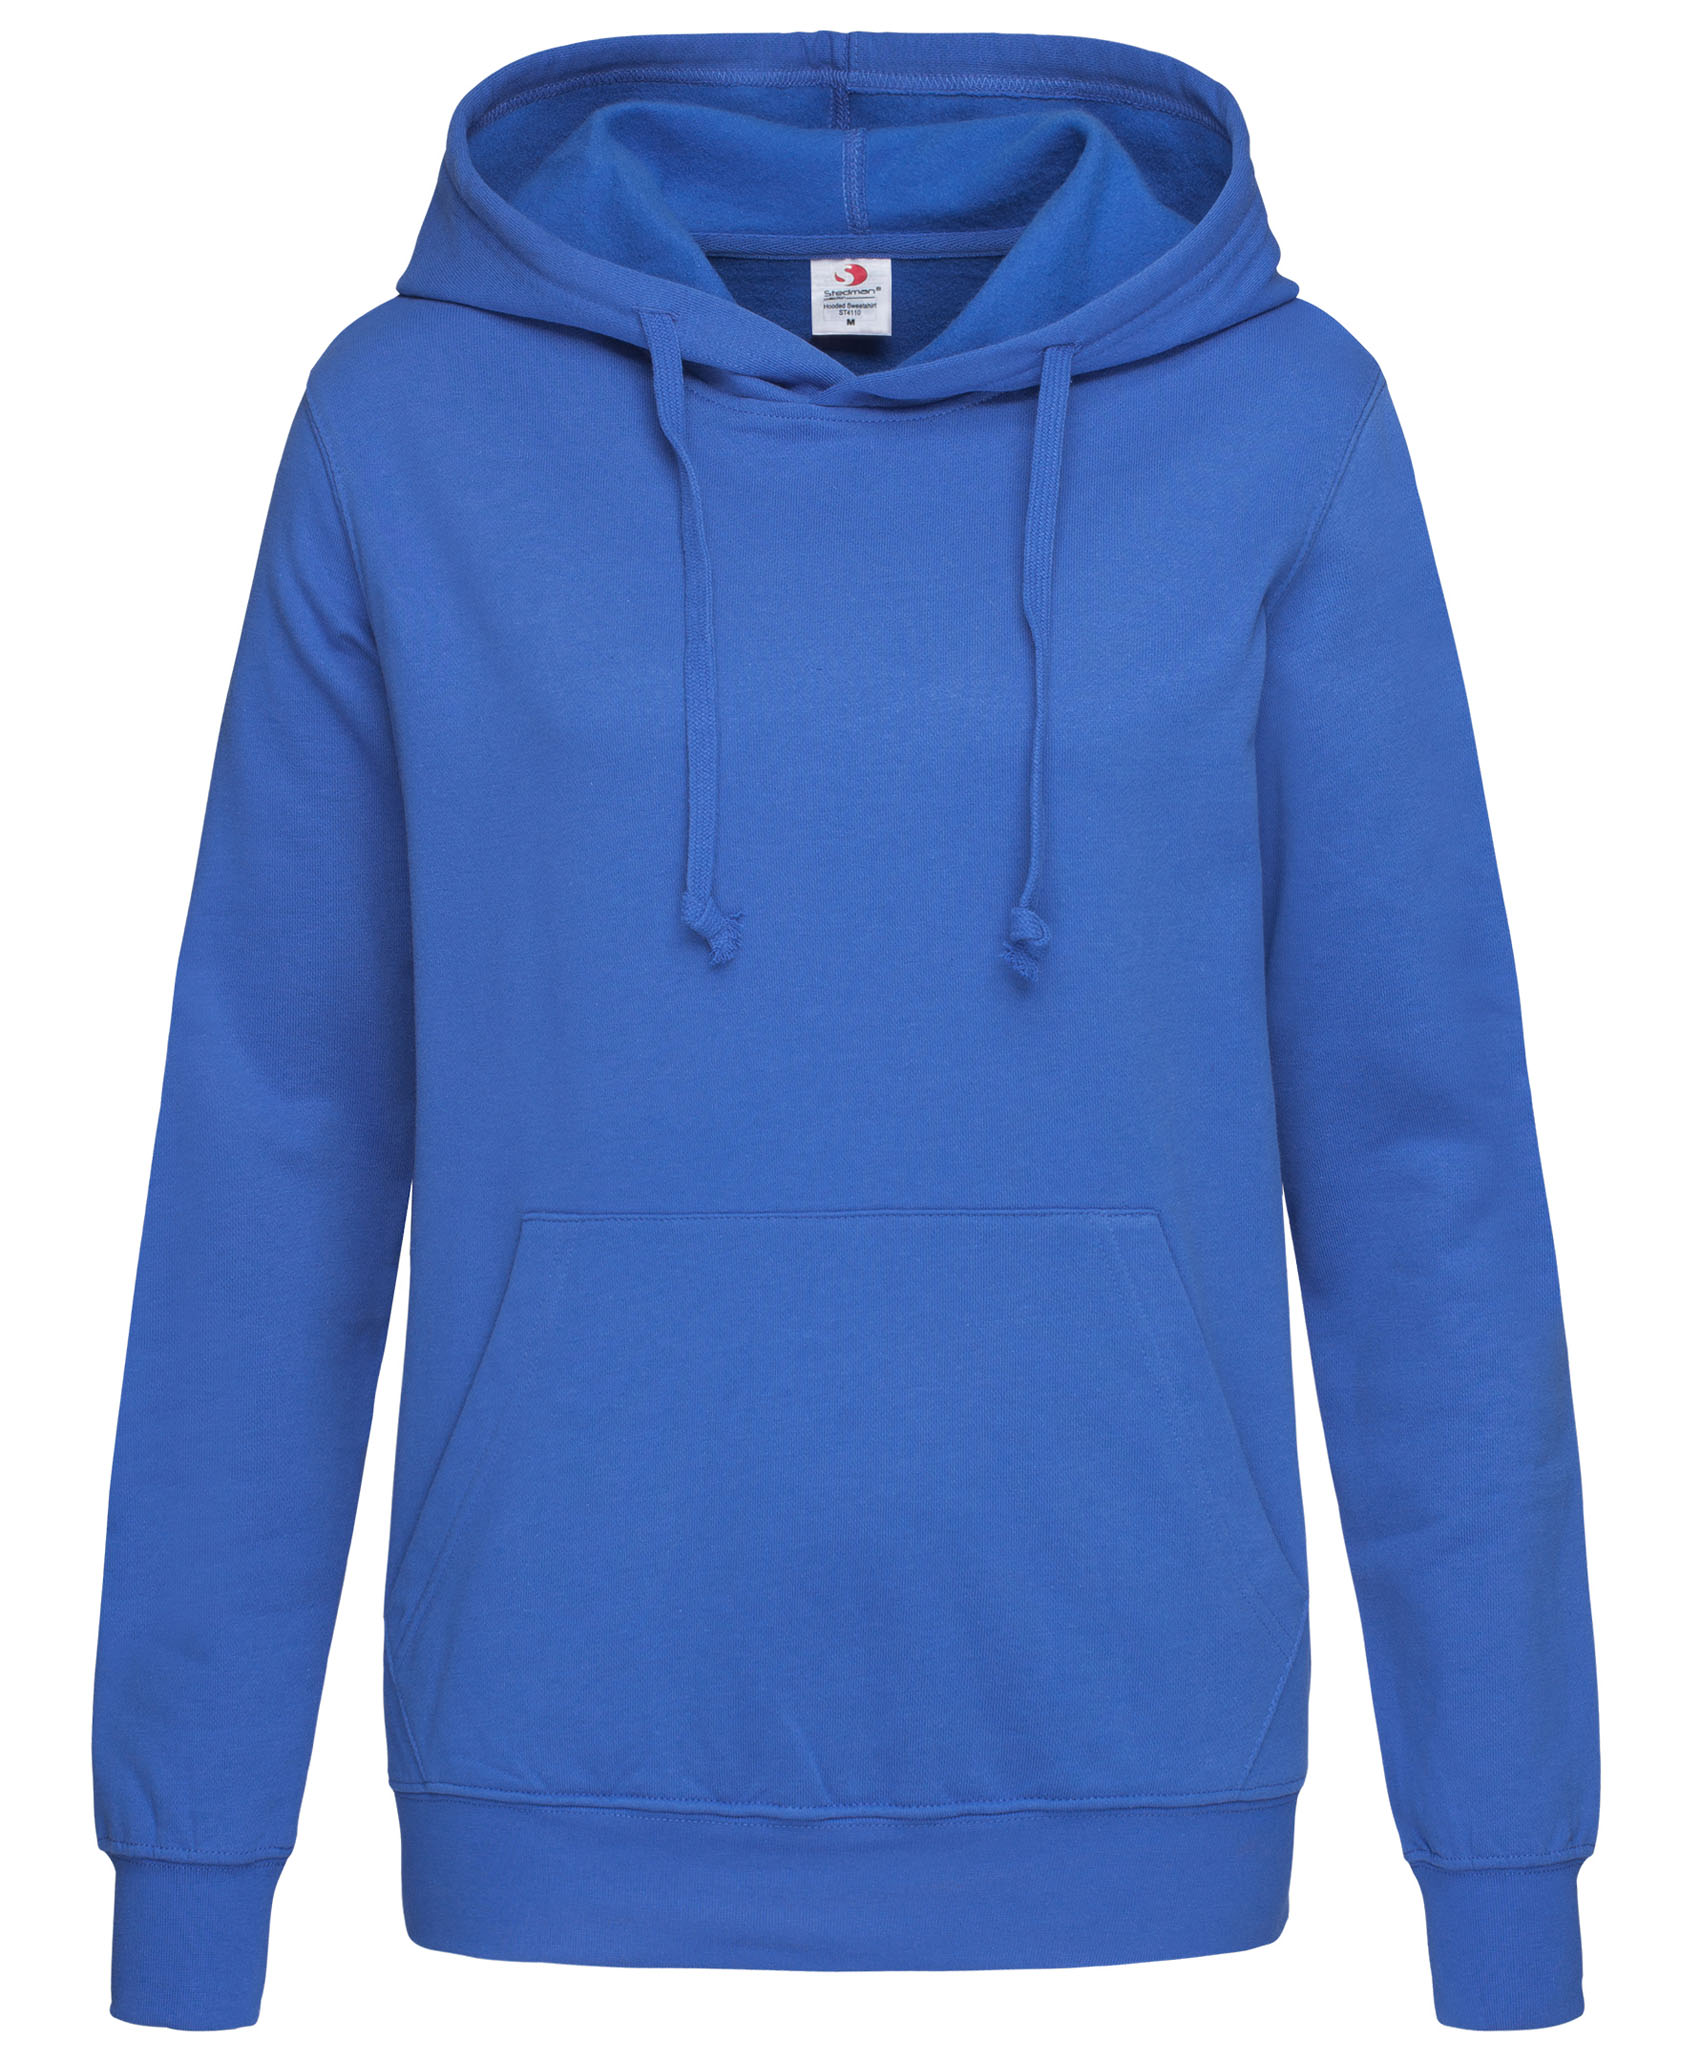 Stedman Sweater Hooded for her